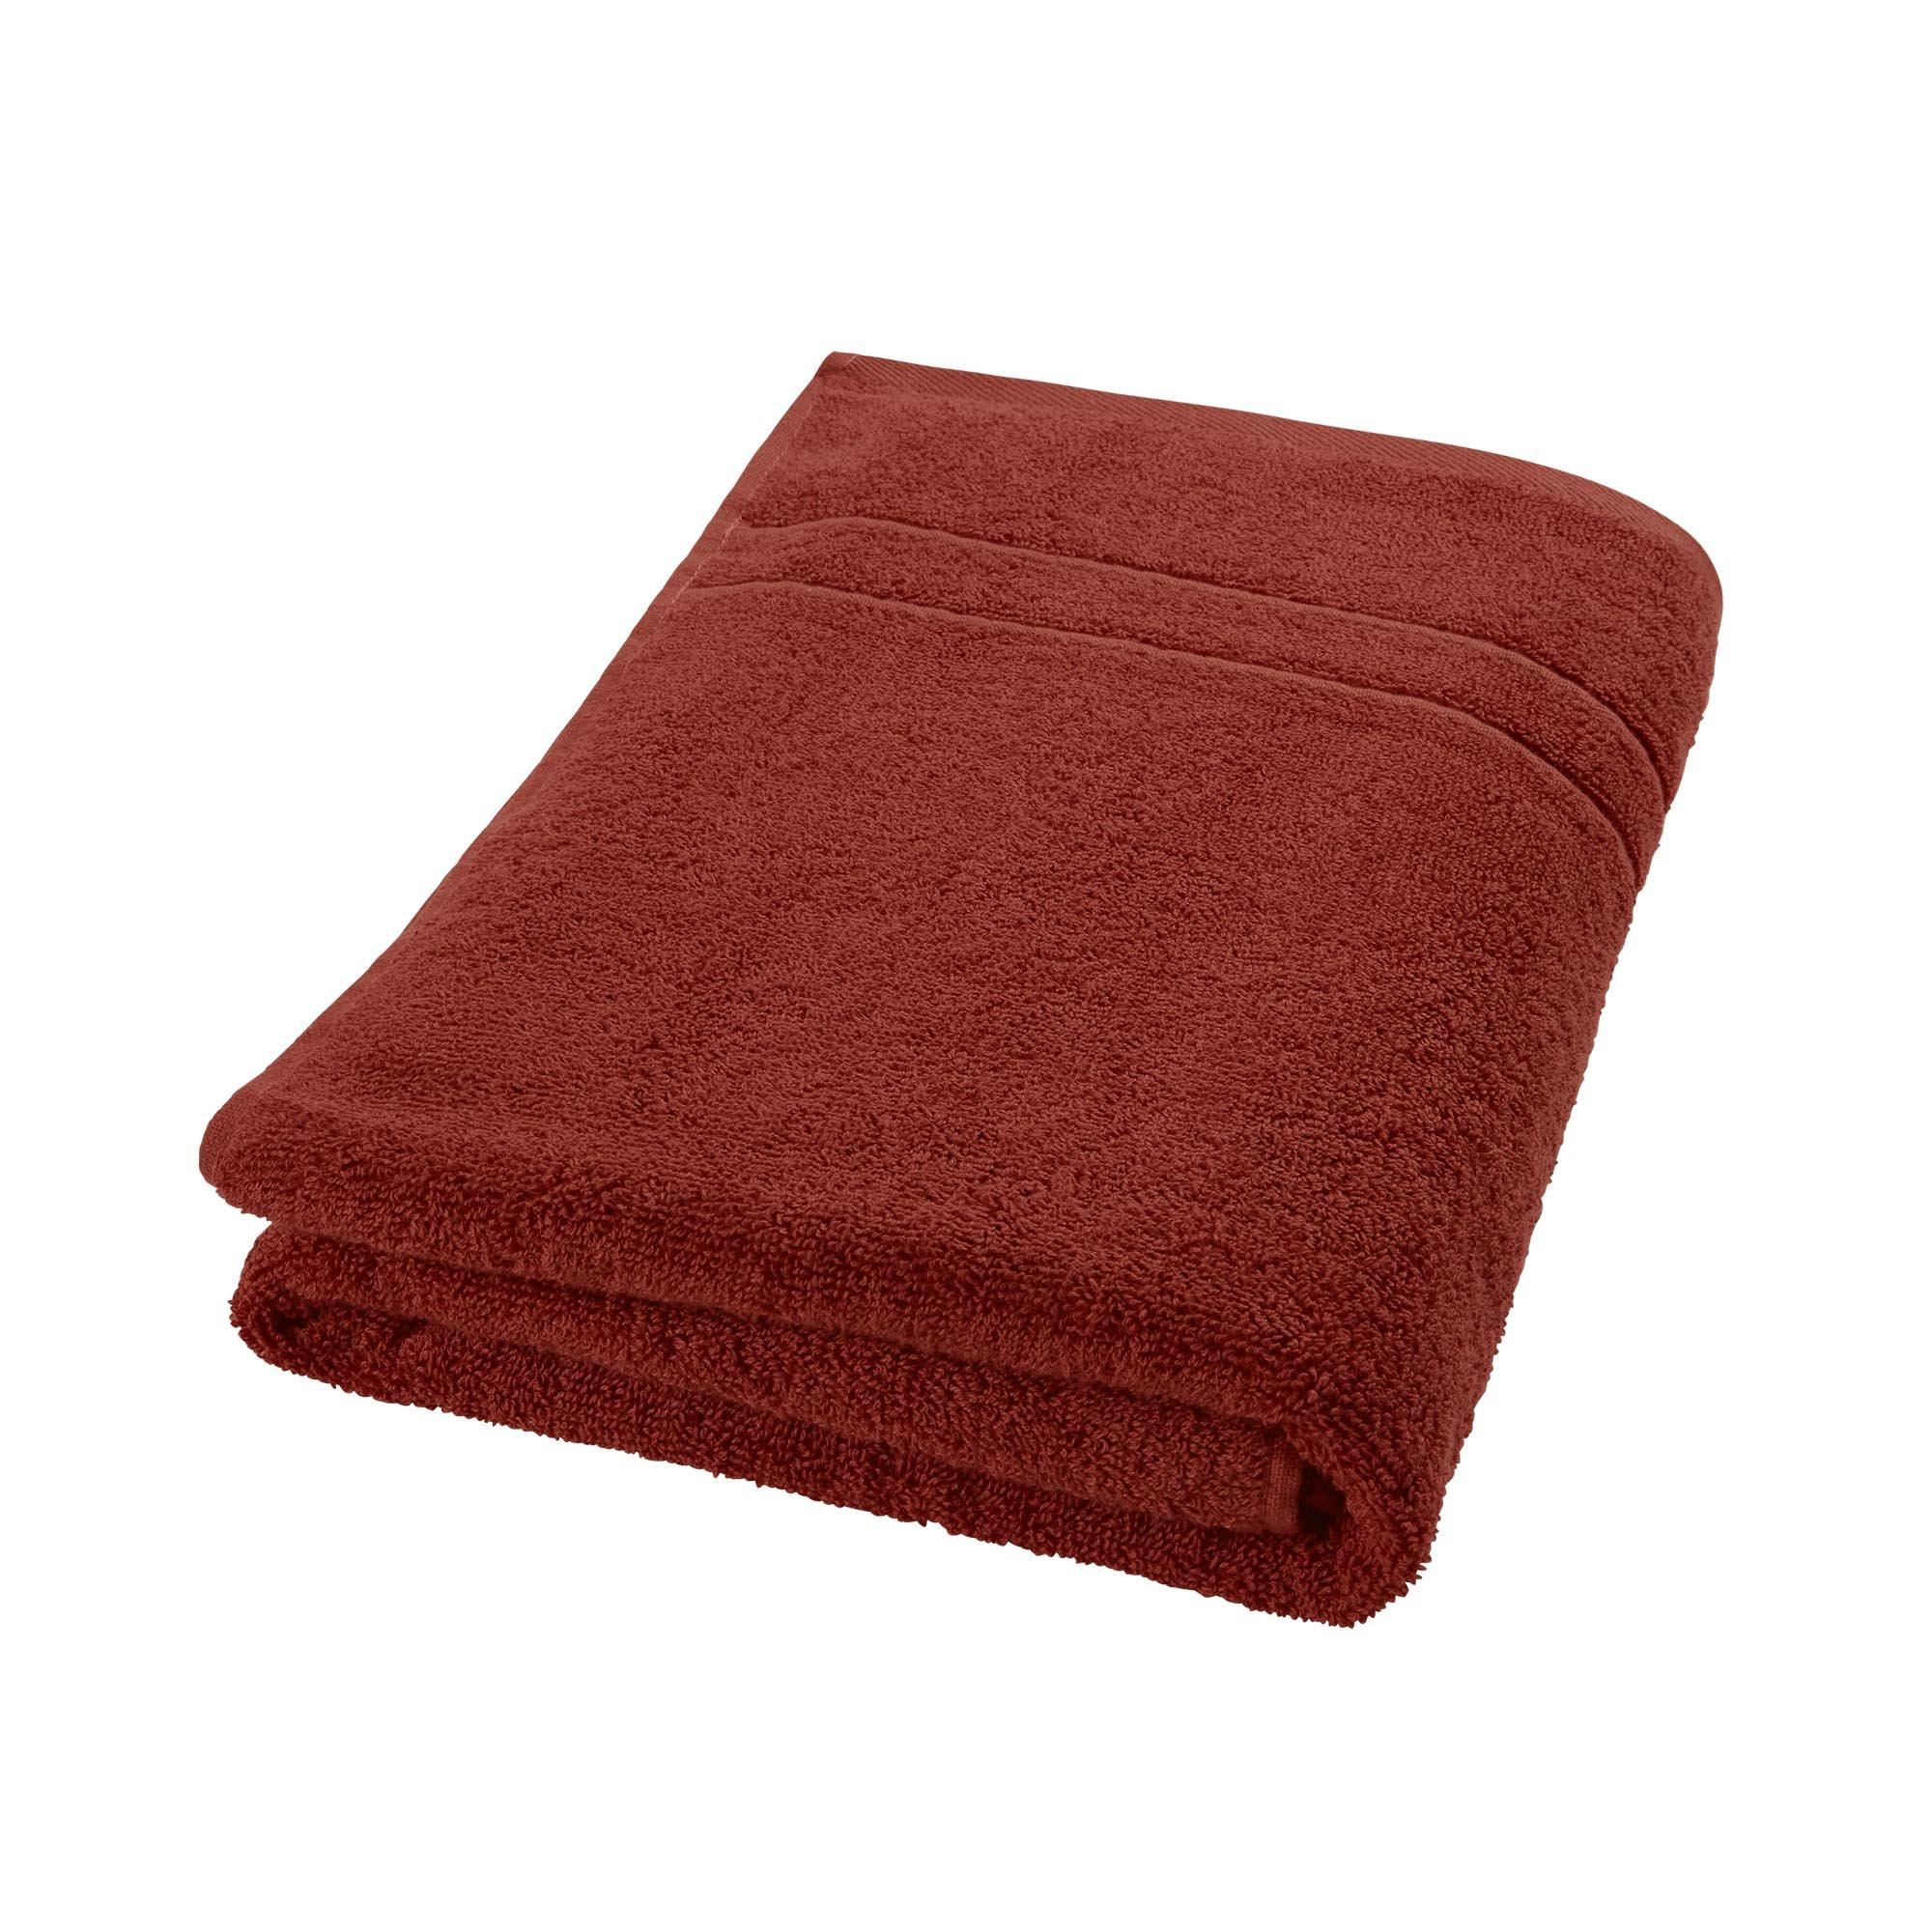 DECOLICIOUS - Toalla de baño 100% algodón Peinado - 550gr/m2 - Naranja Teja